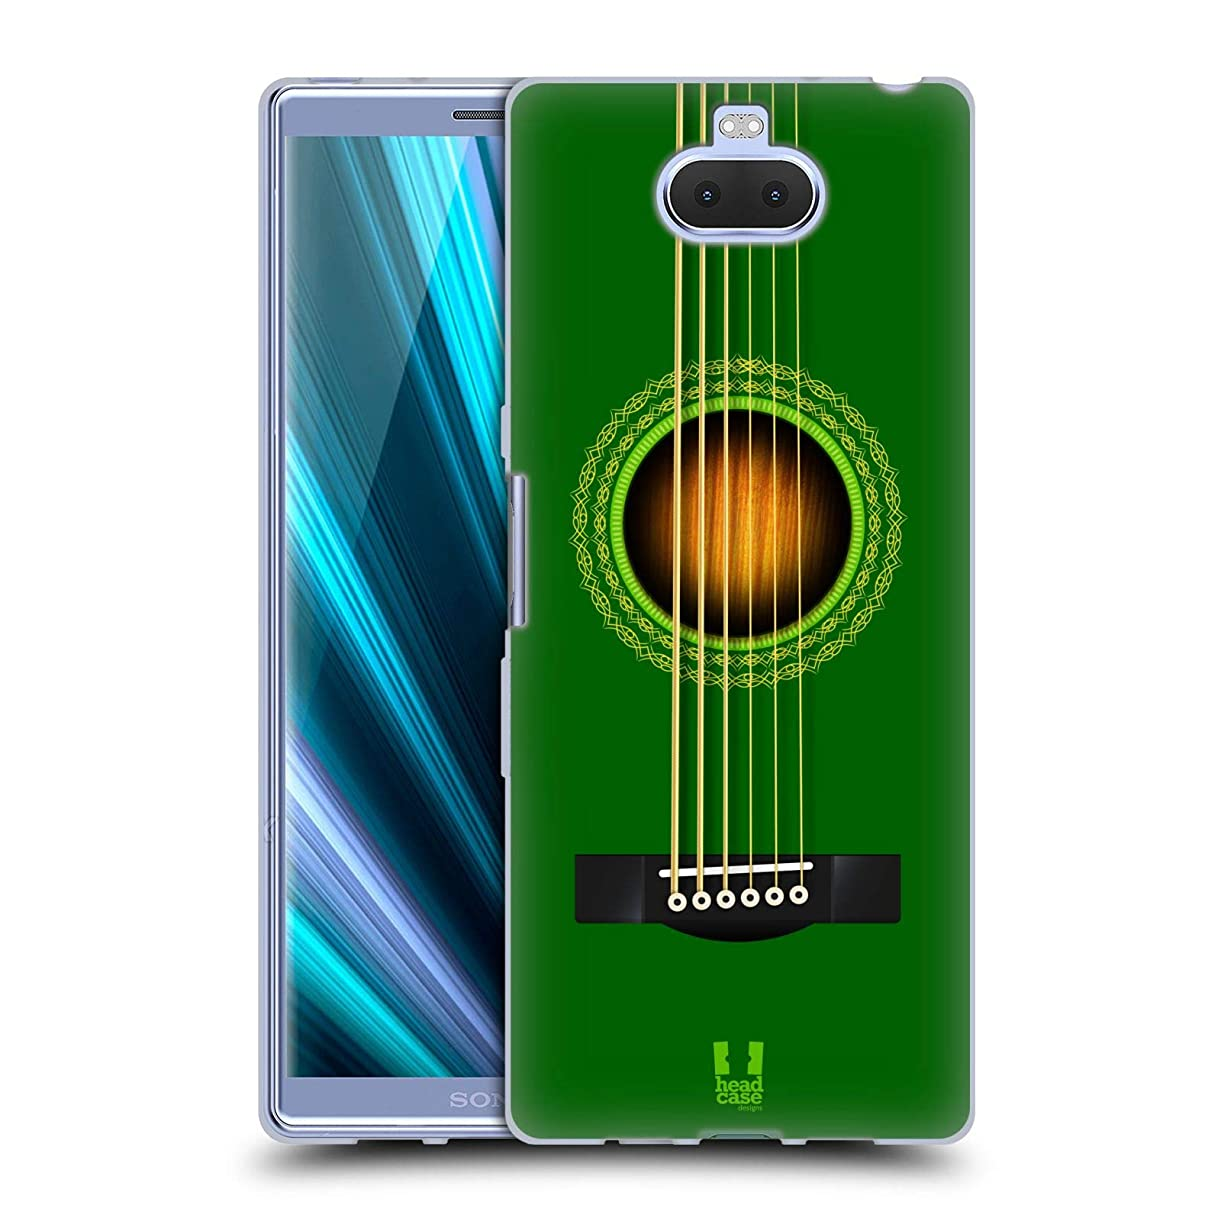 Head Case Designs Green Acoustic Guitar Soft Gel Case for Sony Xperia XA3 Ultra / 10 Plus hoqks0317